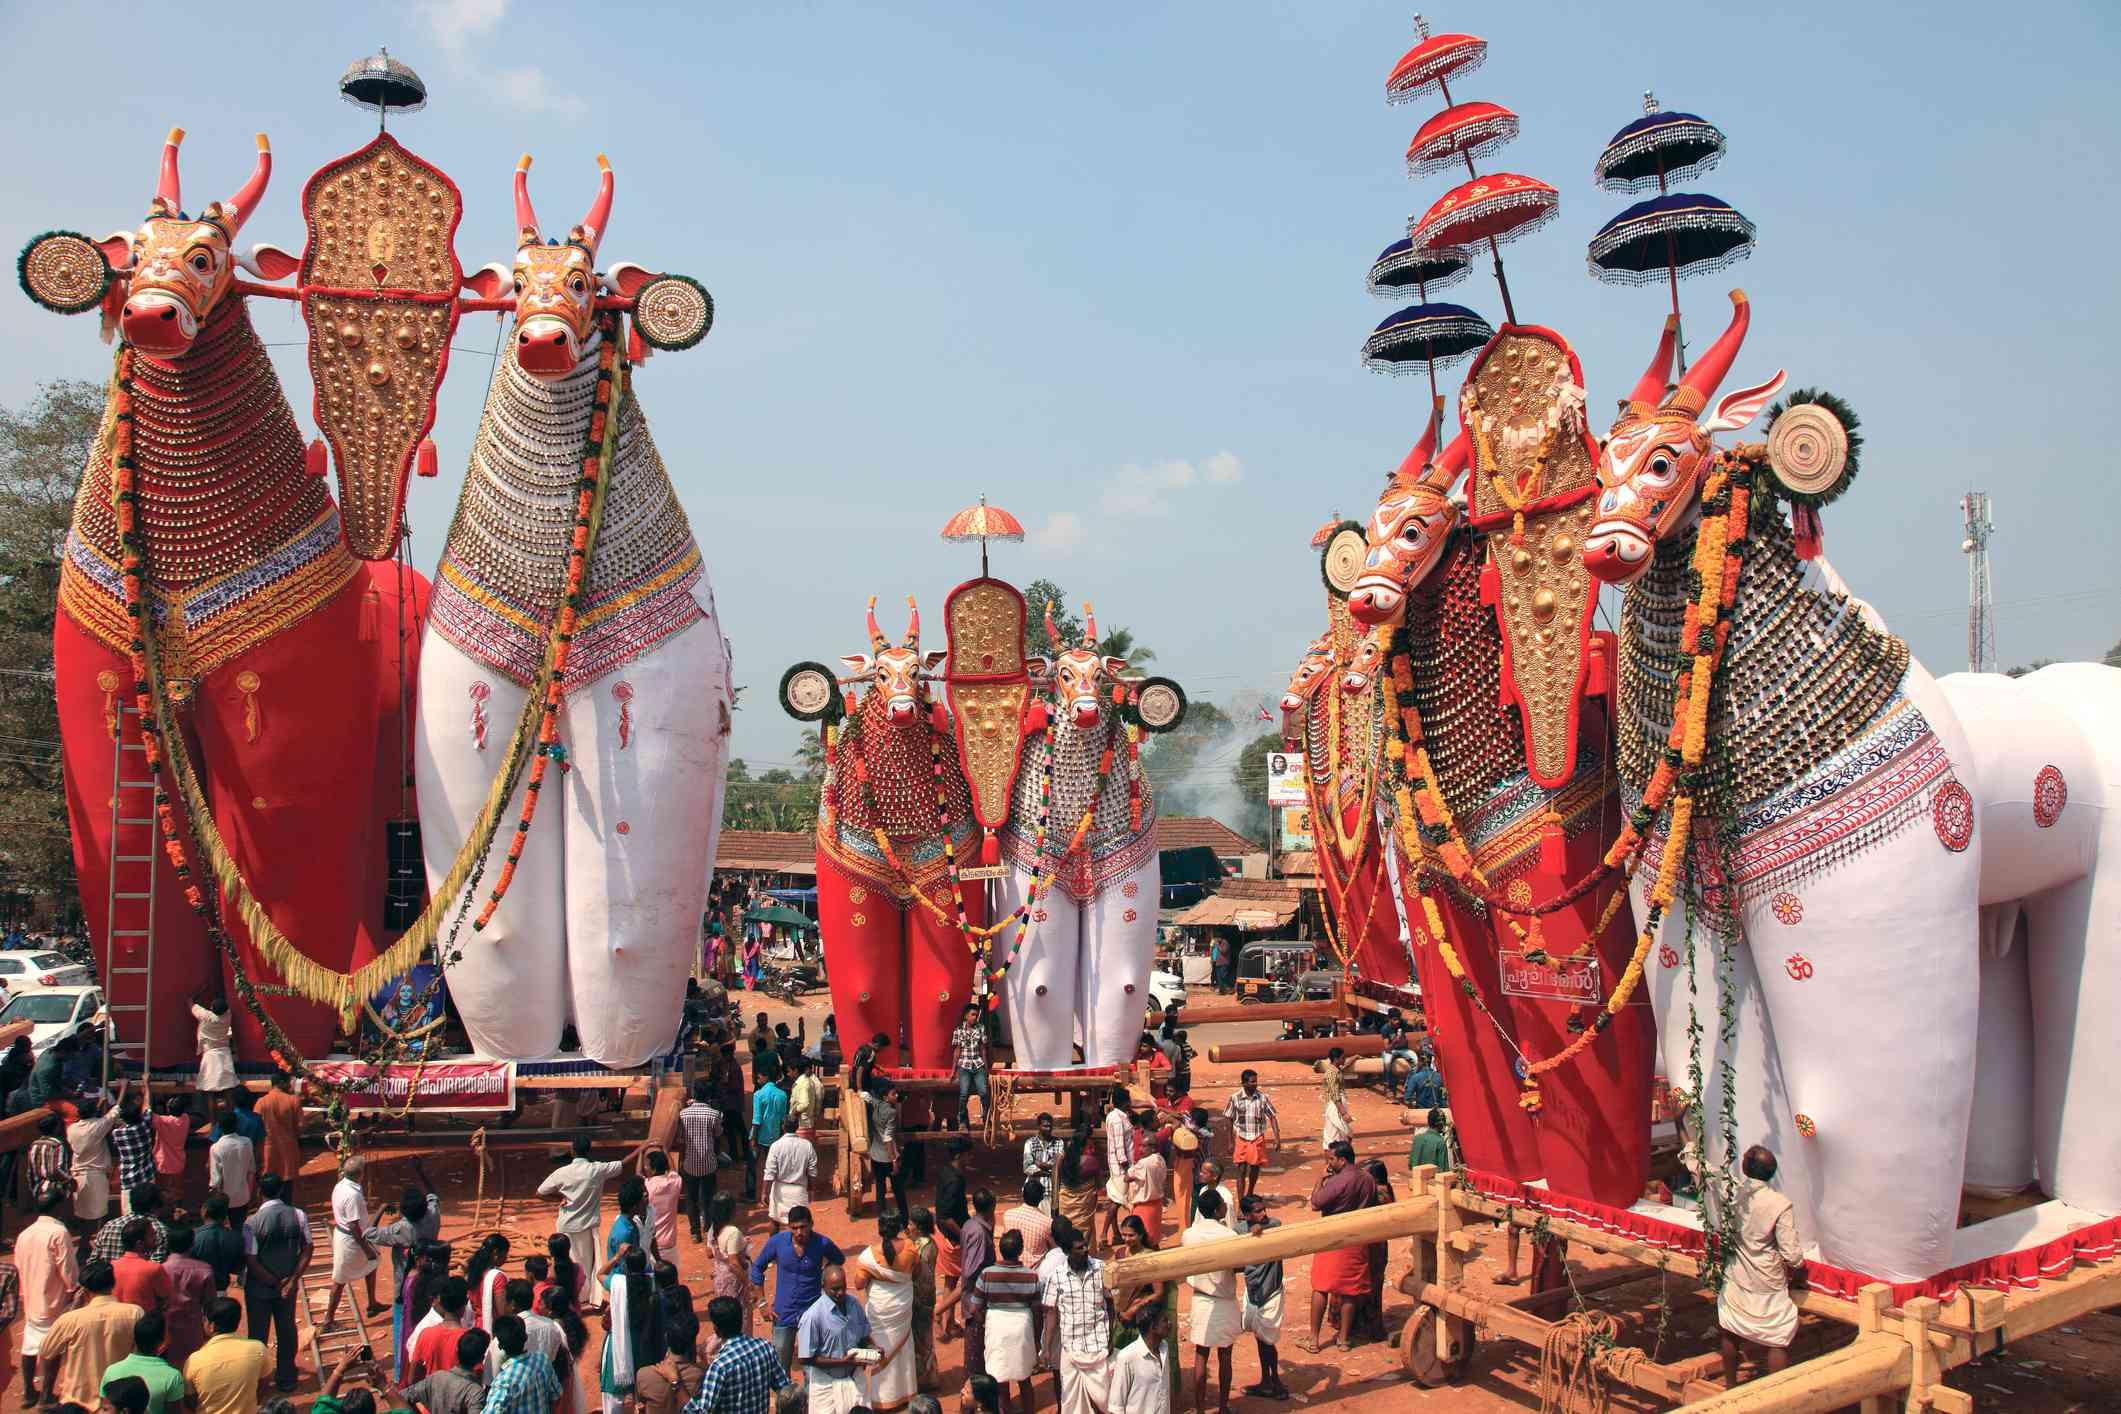 Decorated Bullock effigies of Shivratri festival